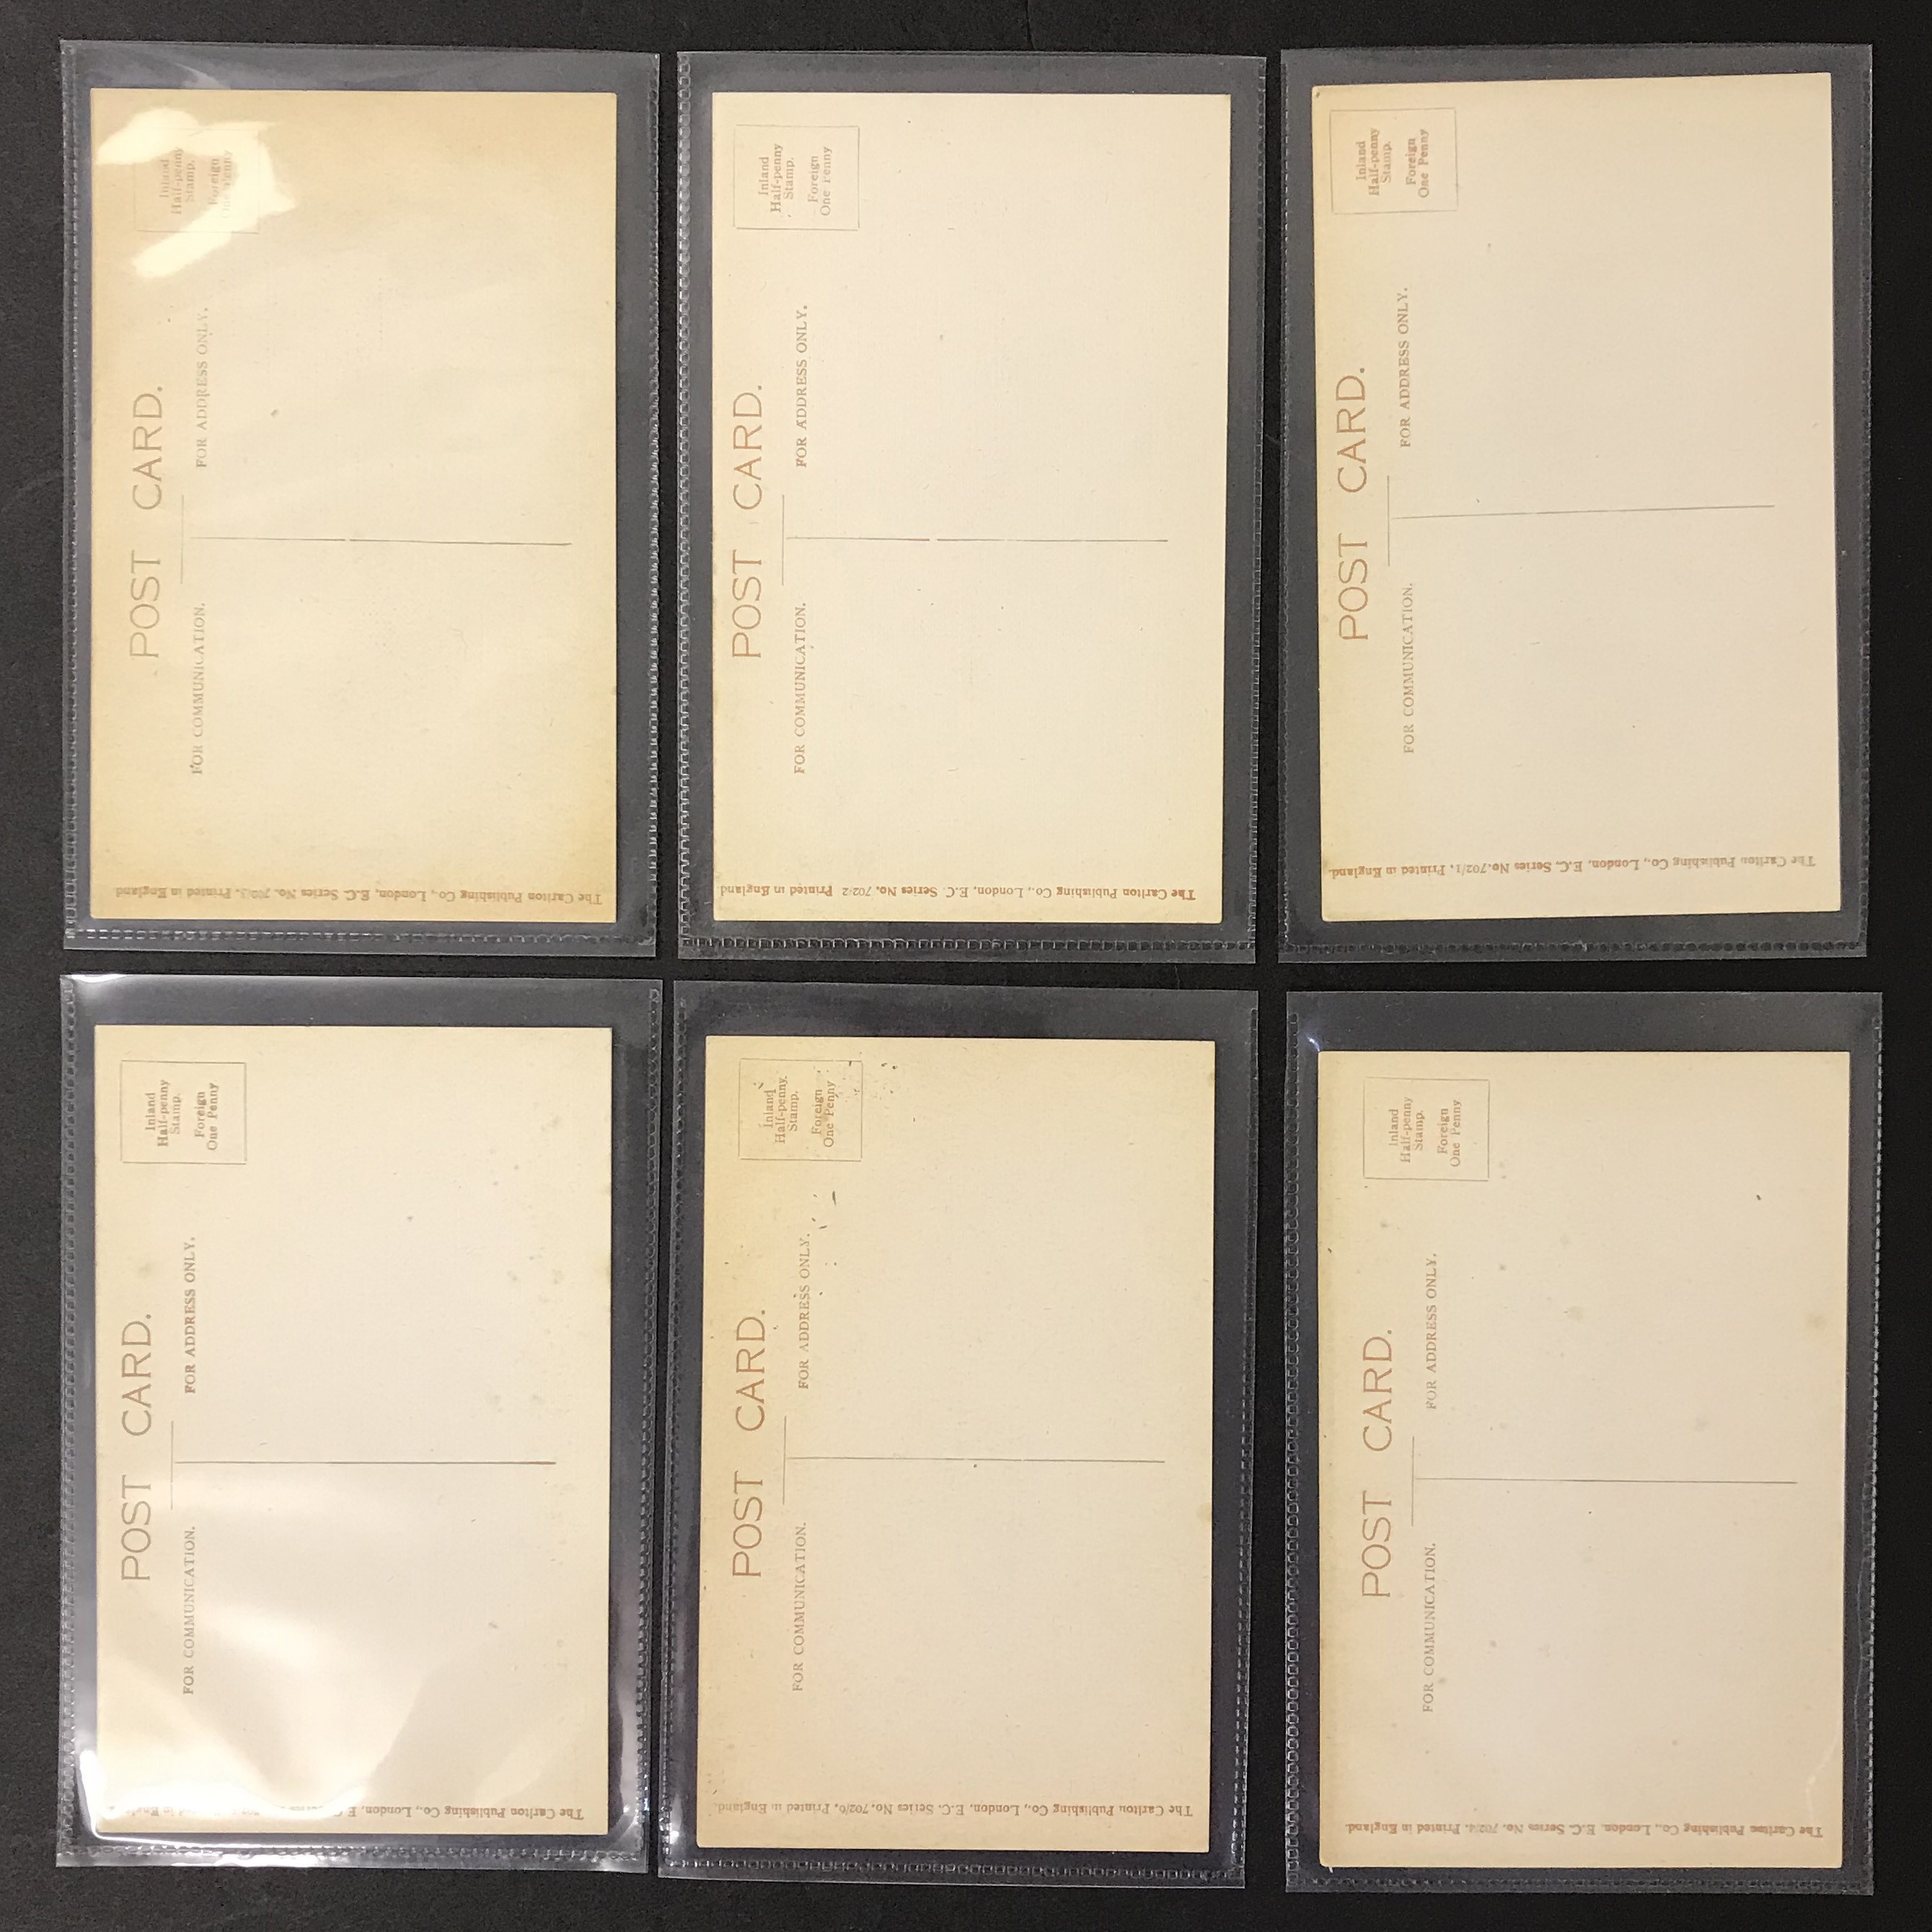 Lot 49 - POSTCARDS - SET OF SIX GLAMOUR POSTCARDS